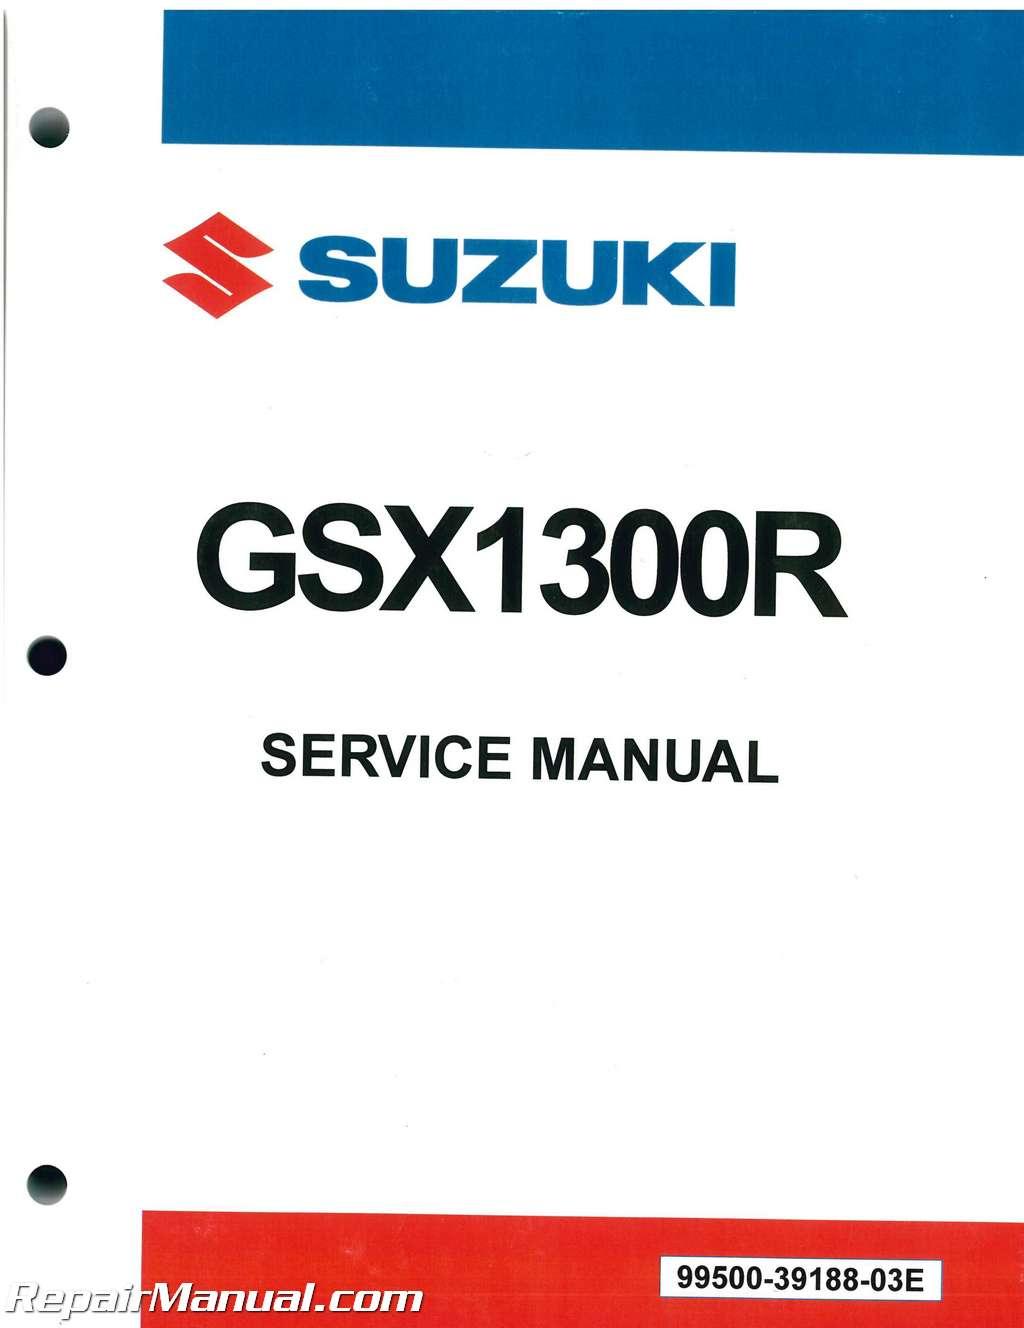 1999 2007 suzuki gsxr1300 hayabusa motorcycle service manual rh repairmanual com suzuki swift 2007 service manual 2007 suzuki sx4 service manual pdf